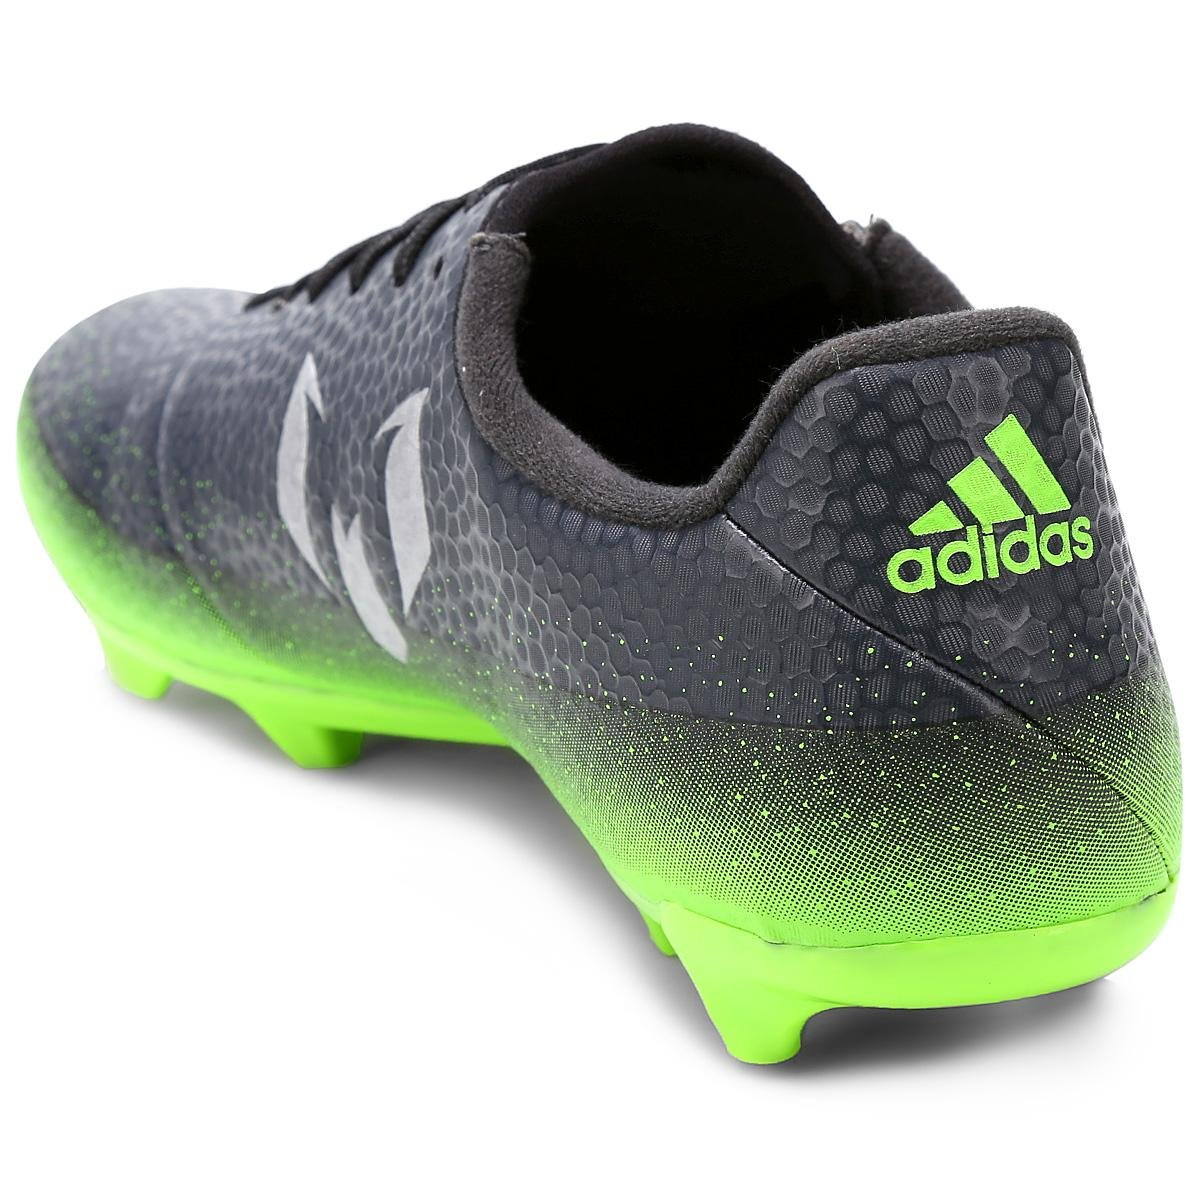 037ca31f4b Chuteira Campo Adidas Messi 16.3 FG Masculina - Chumbo e Verde Limão ...